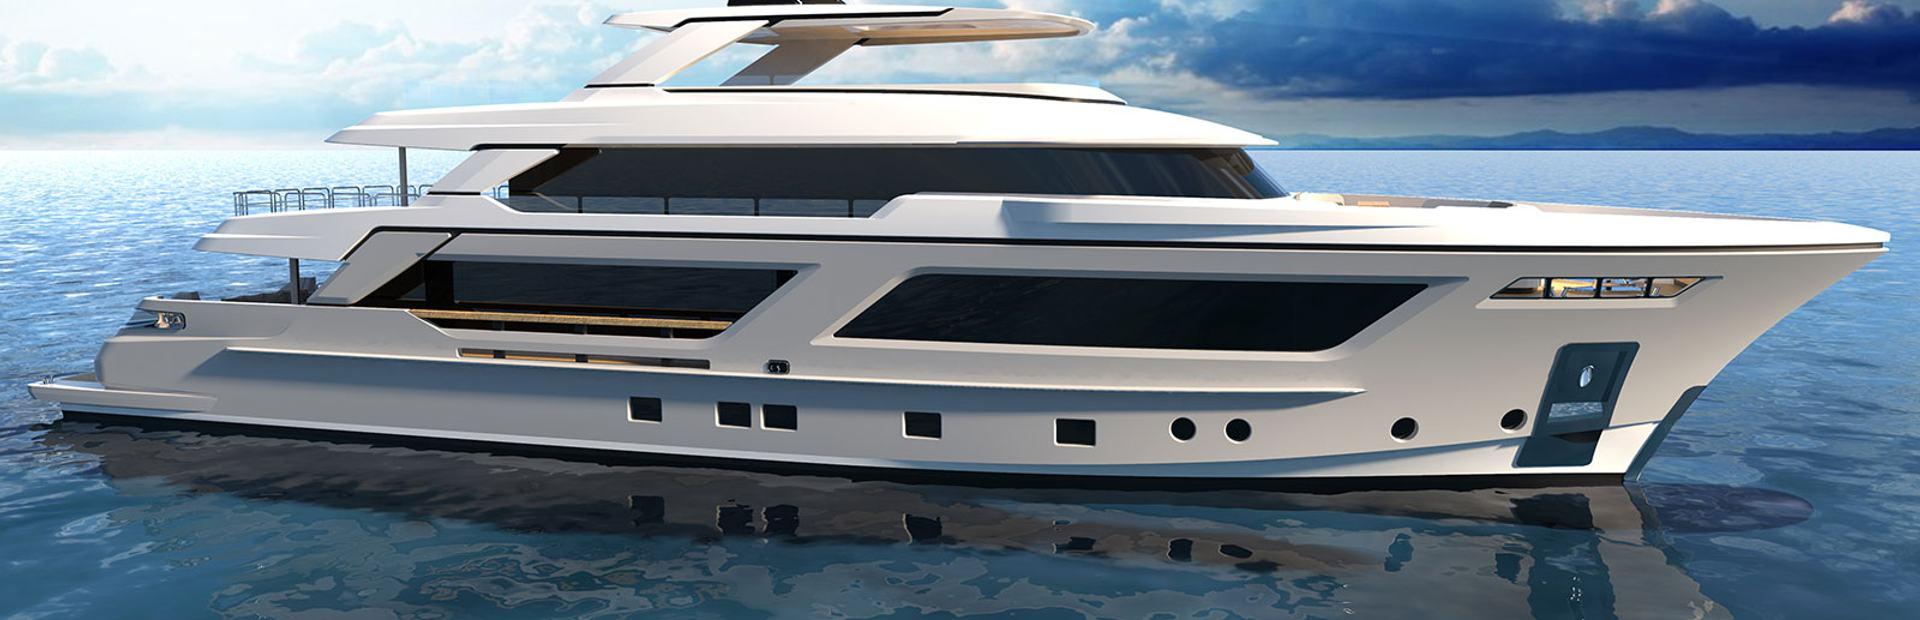 RJ130 Yacht Charter